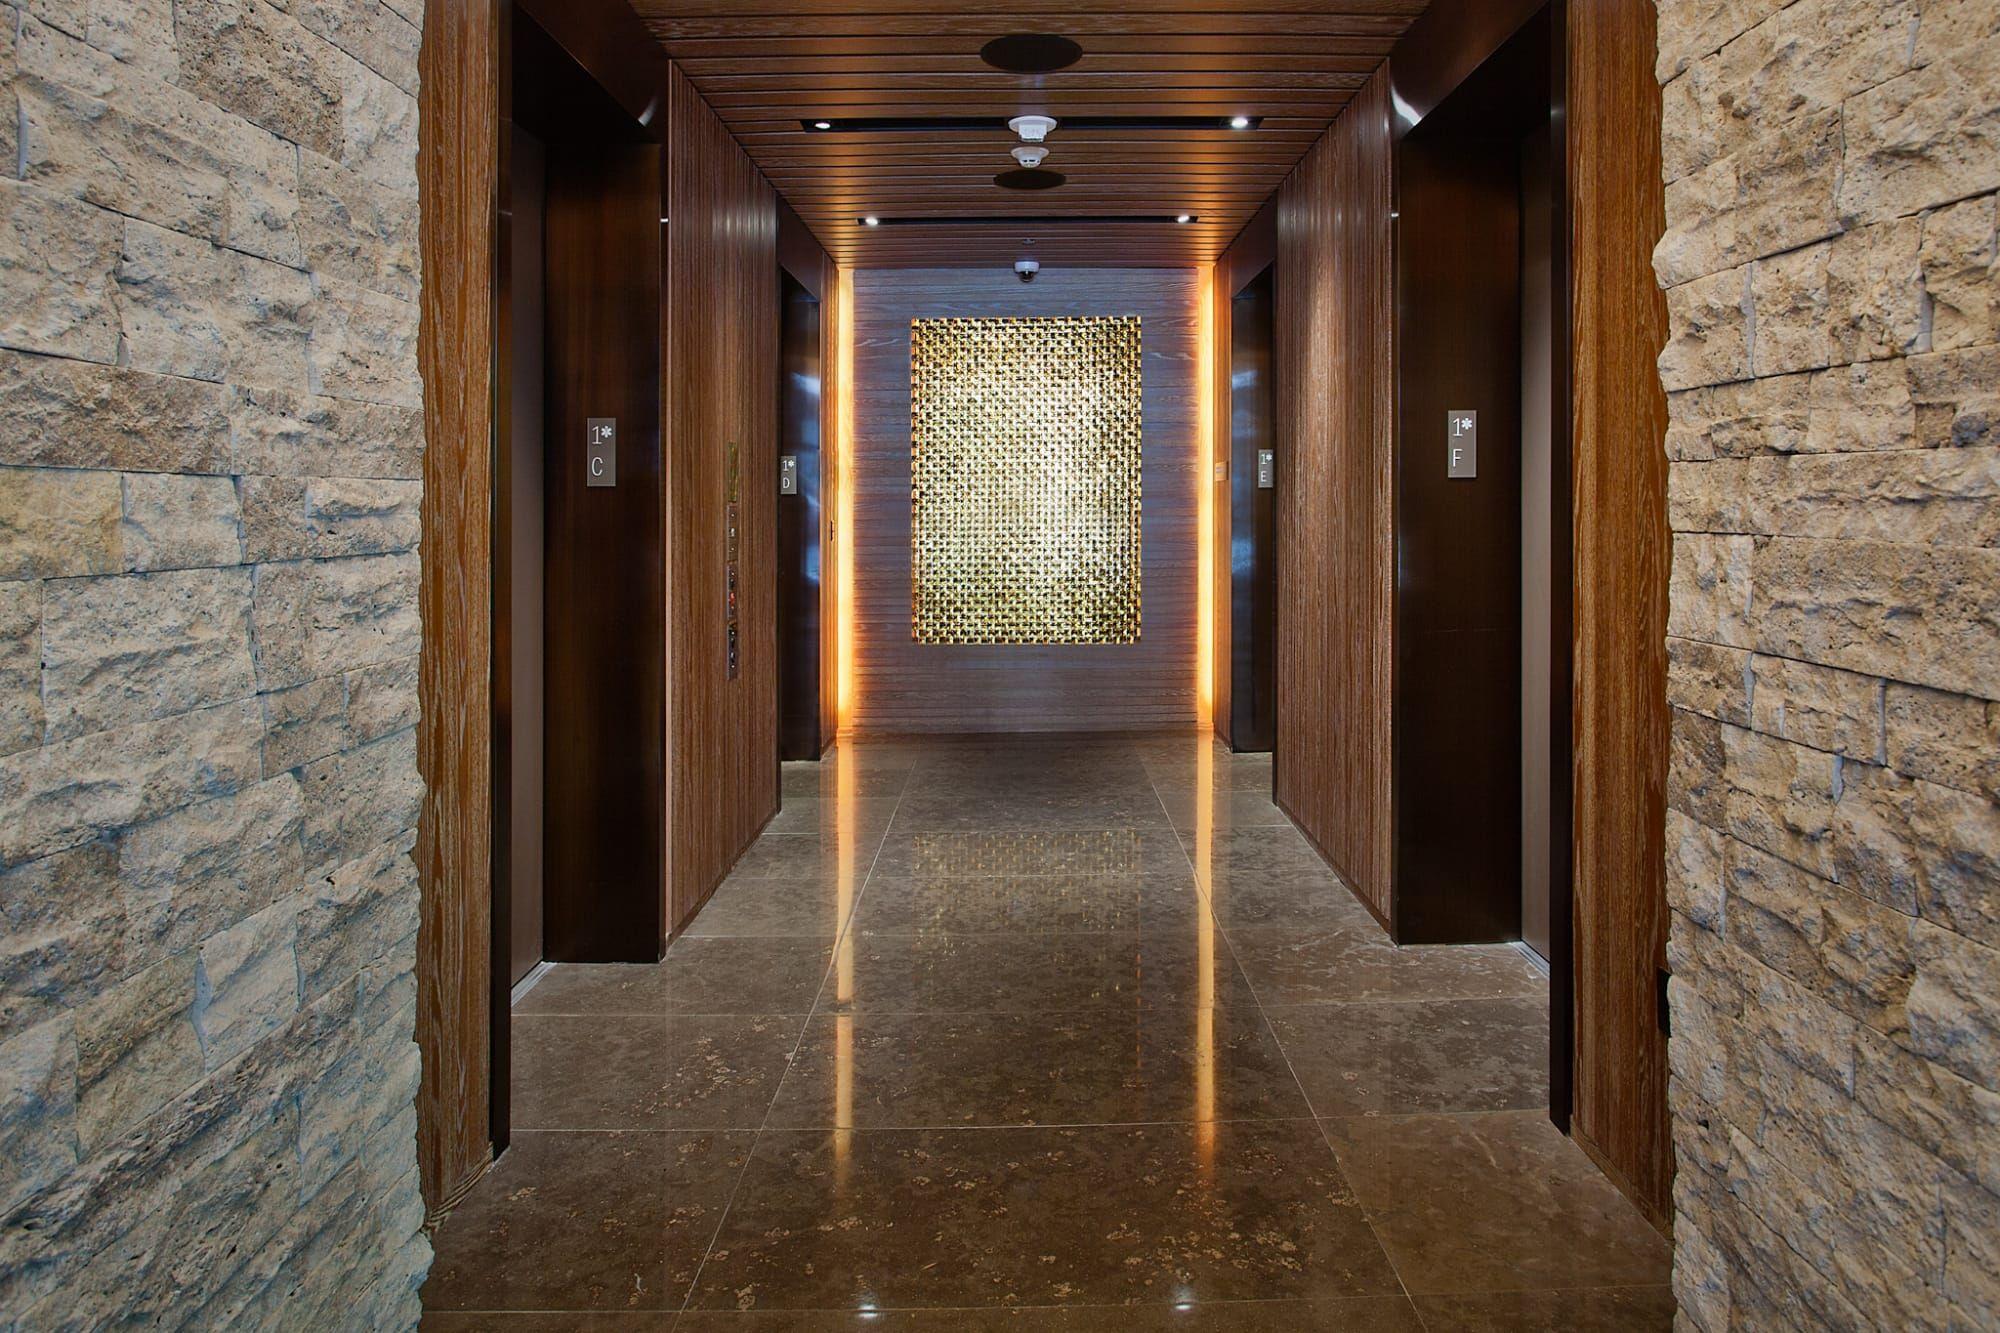 Custom Glass Mosaics by Michael Curry Mosaics at EAST